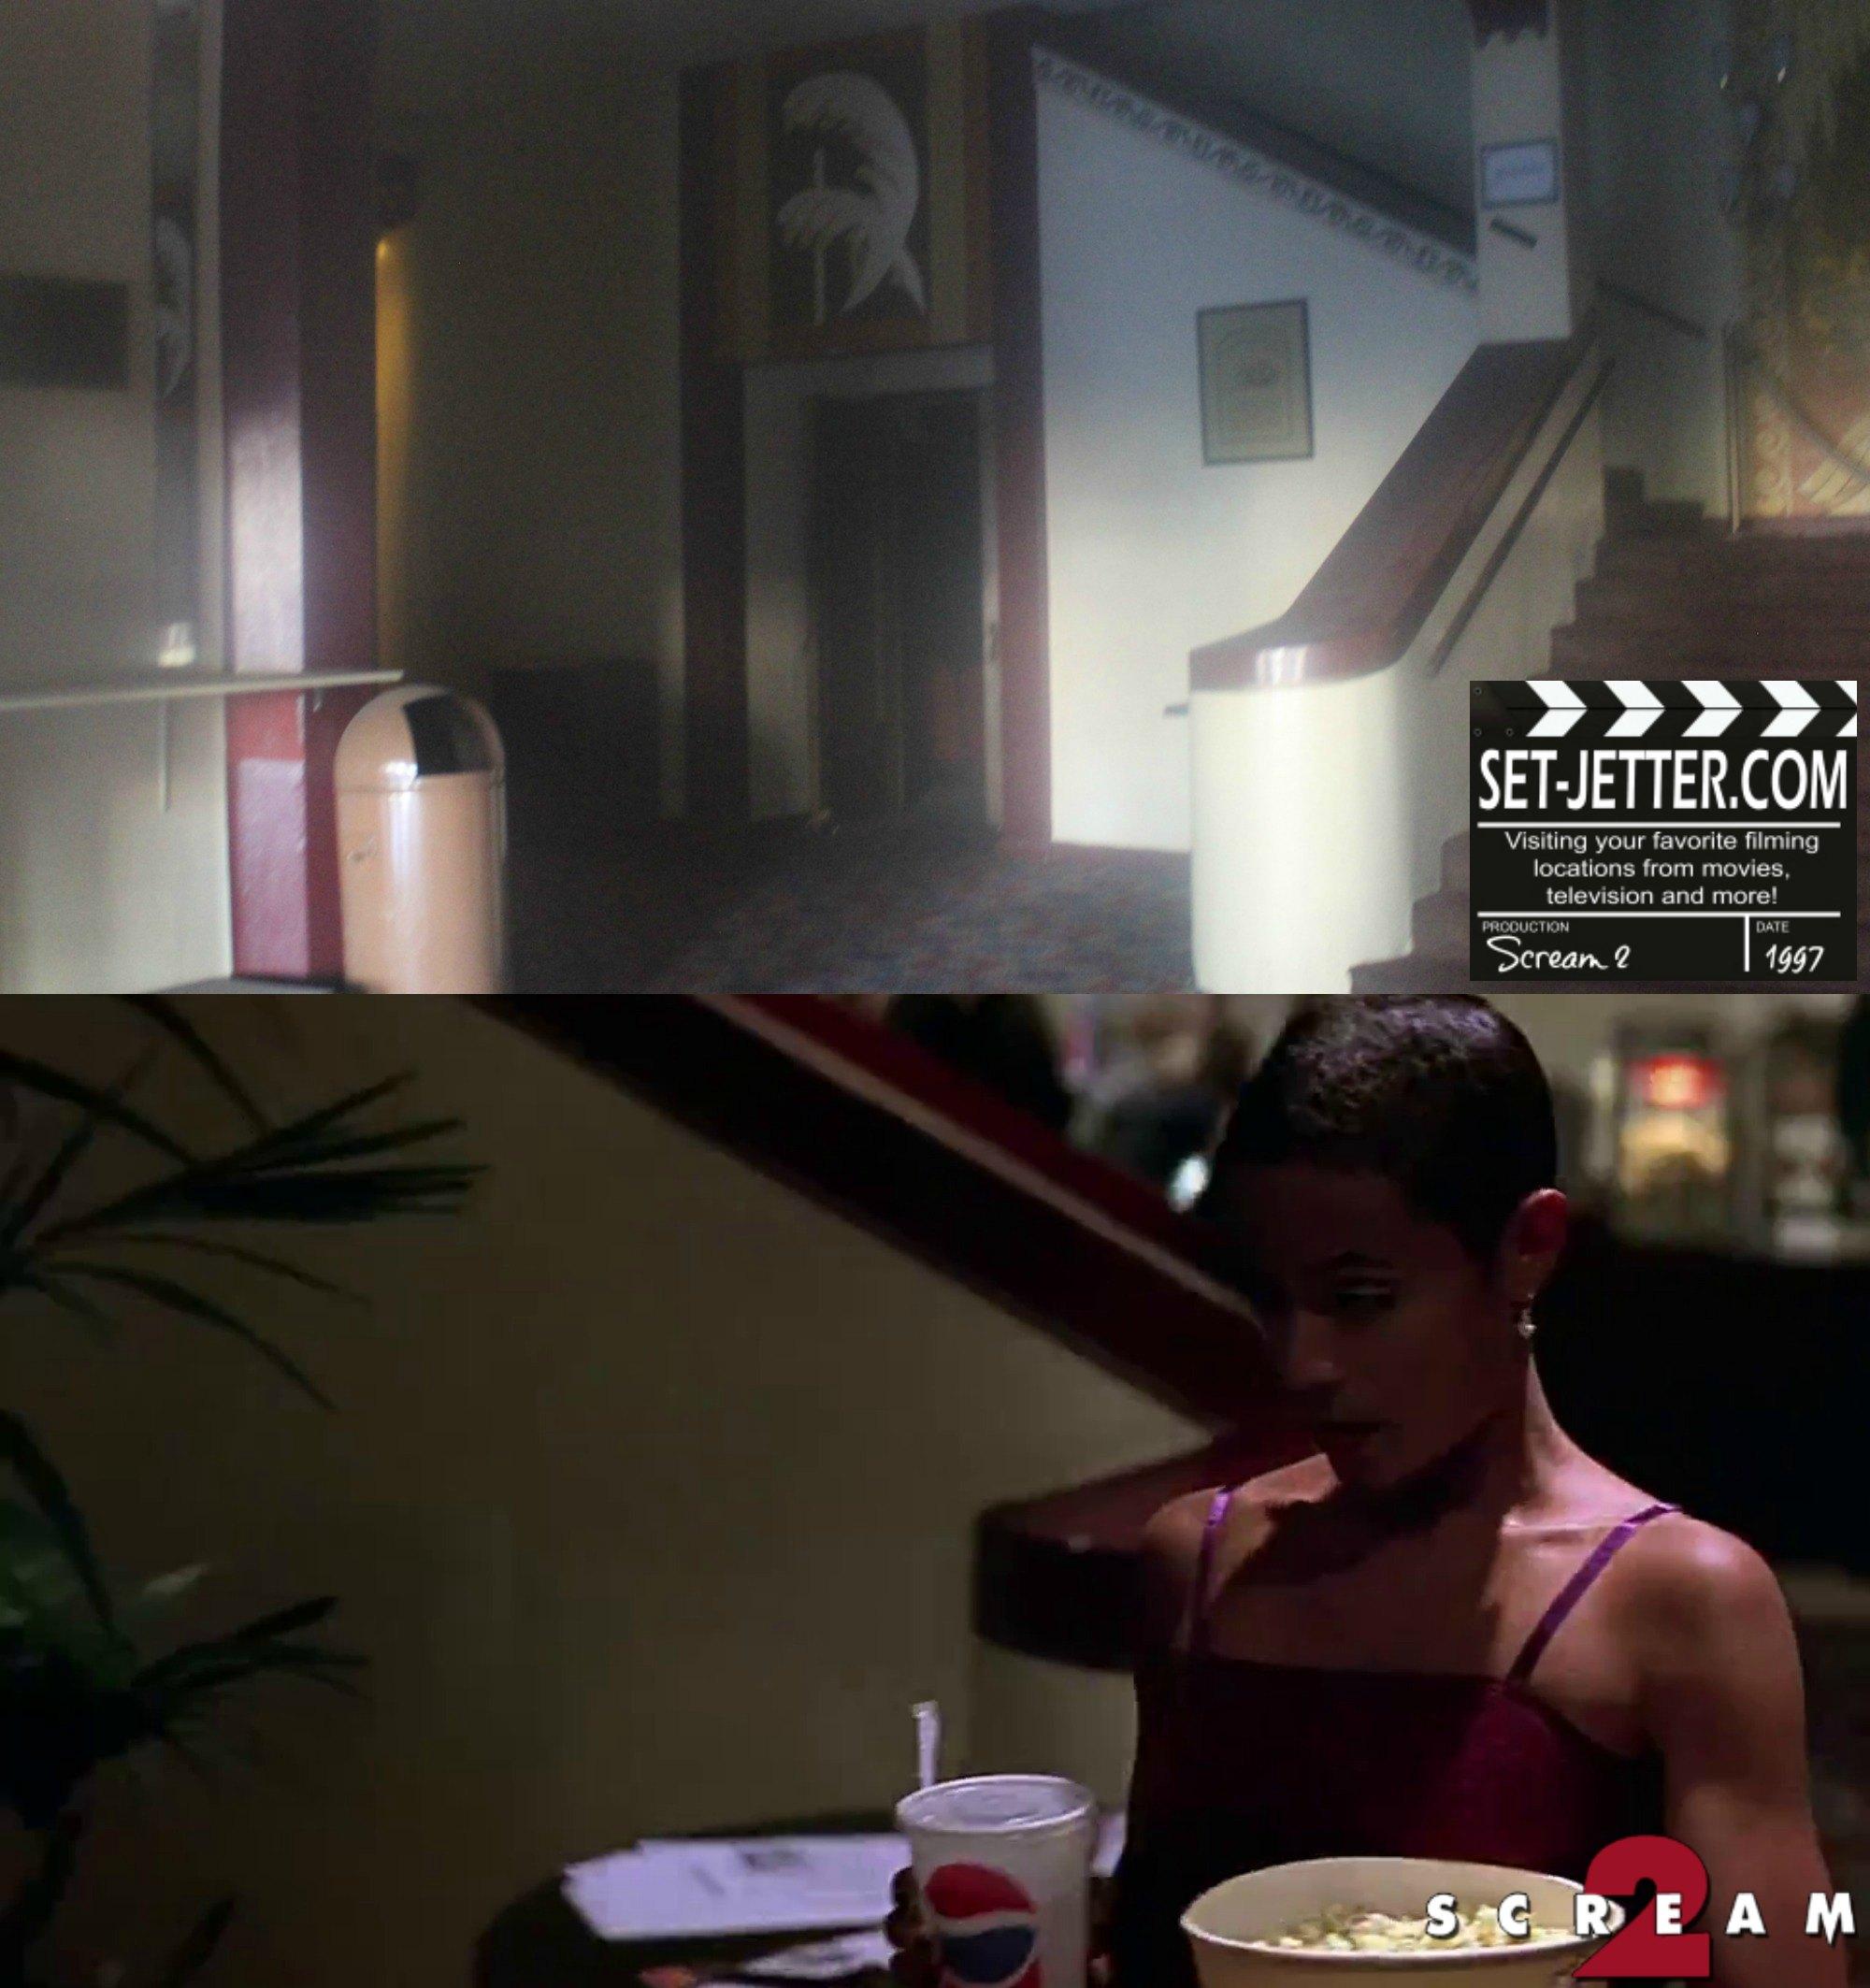 Scream 2 comparison 13.jpg